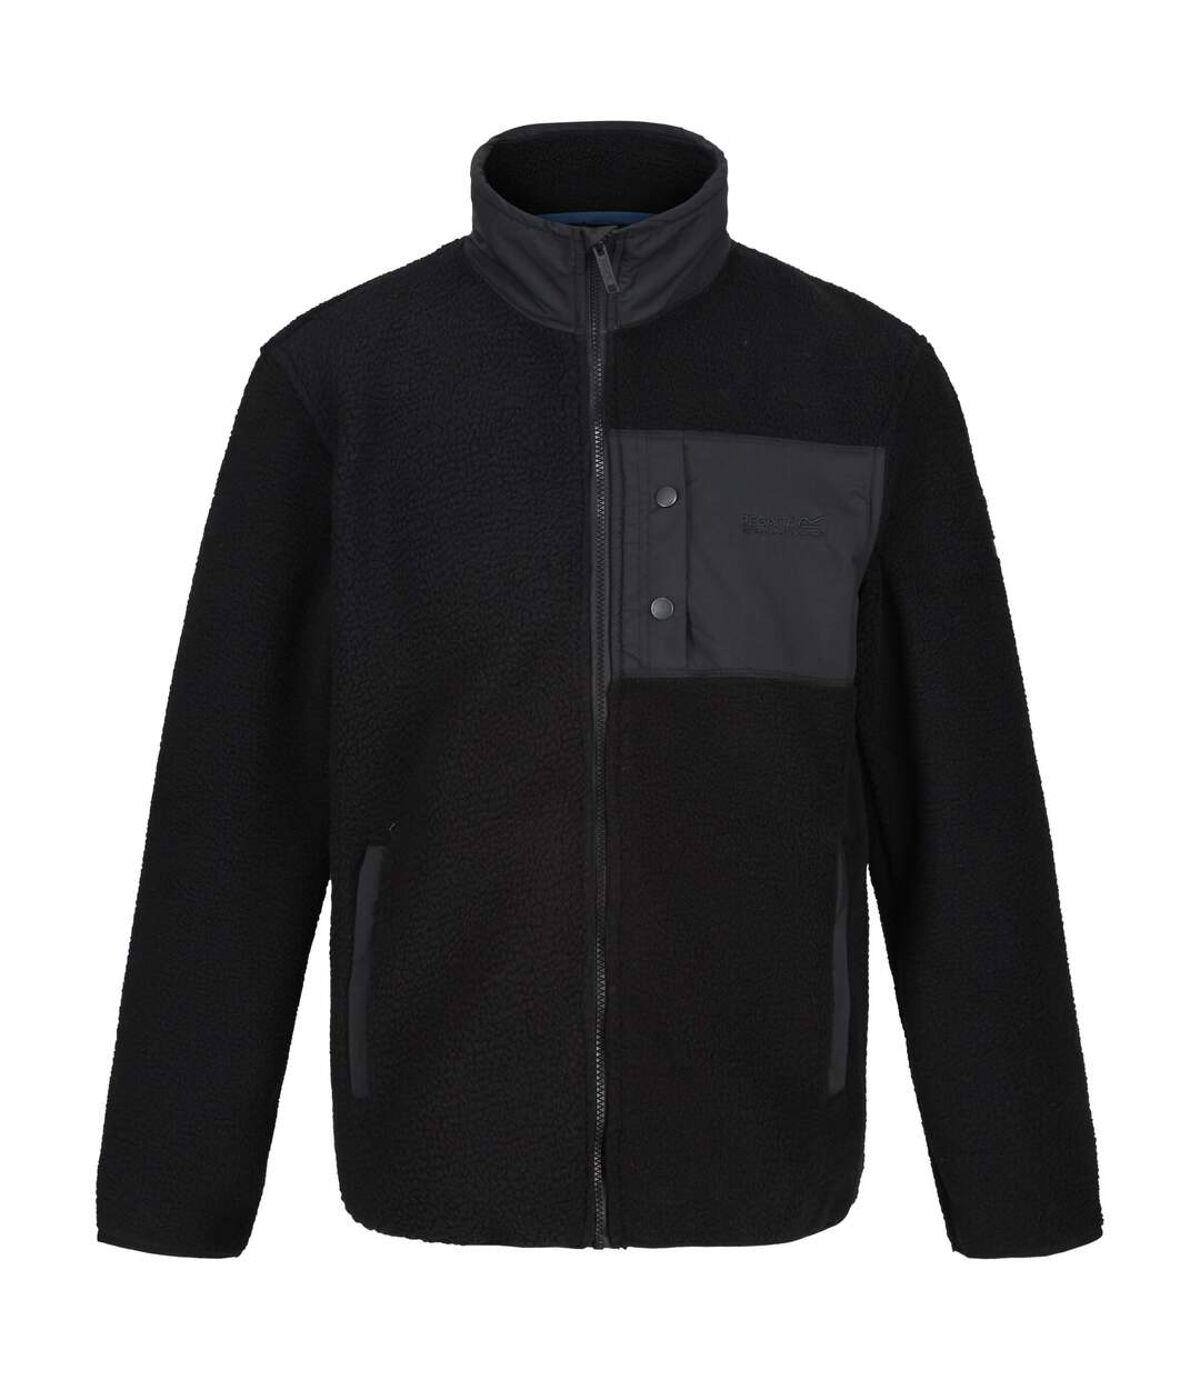 Regatta Mens Cayo Heavyweight Full Zip Fleece Jacket (Black/Black) - UTRG4599